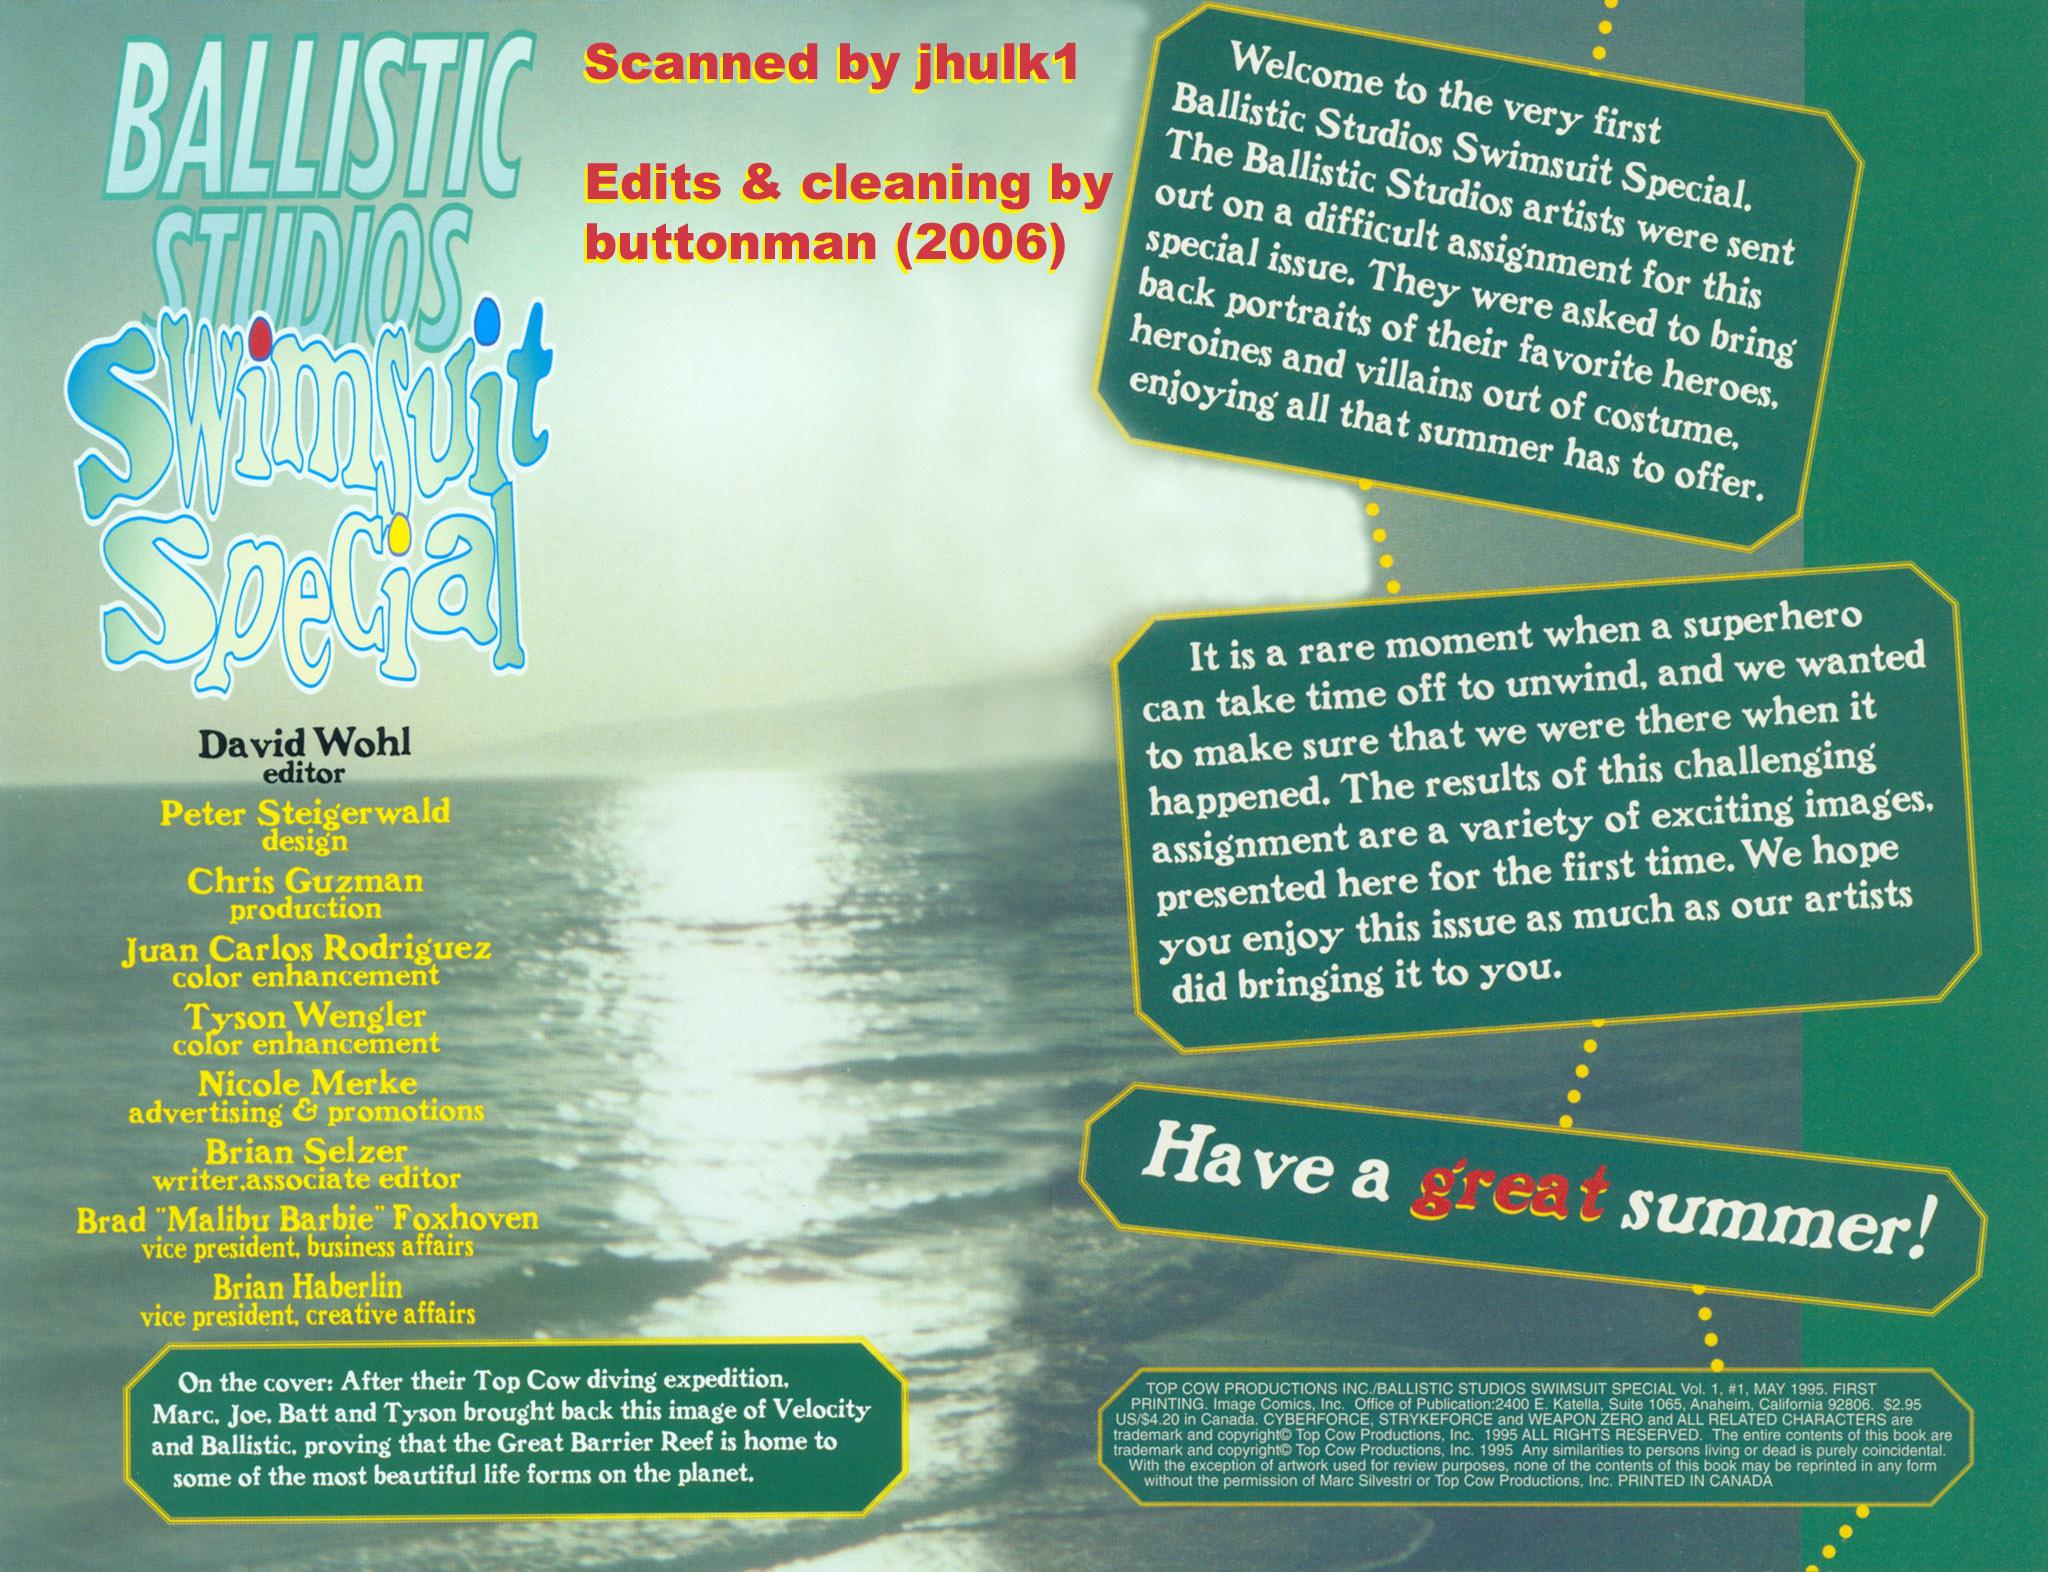 Read online Ballistic Studios Swimsuit Special comic -  Issue #1 - 2